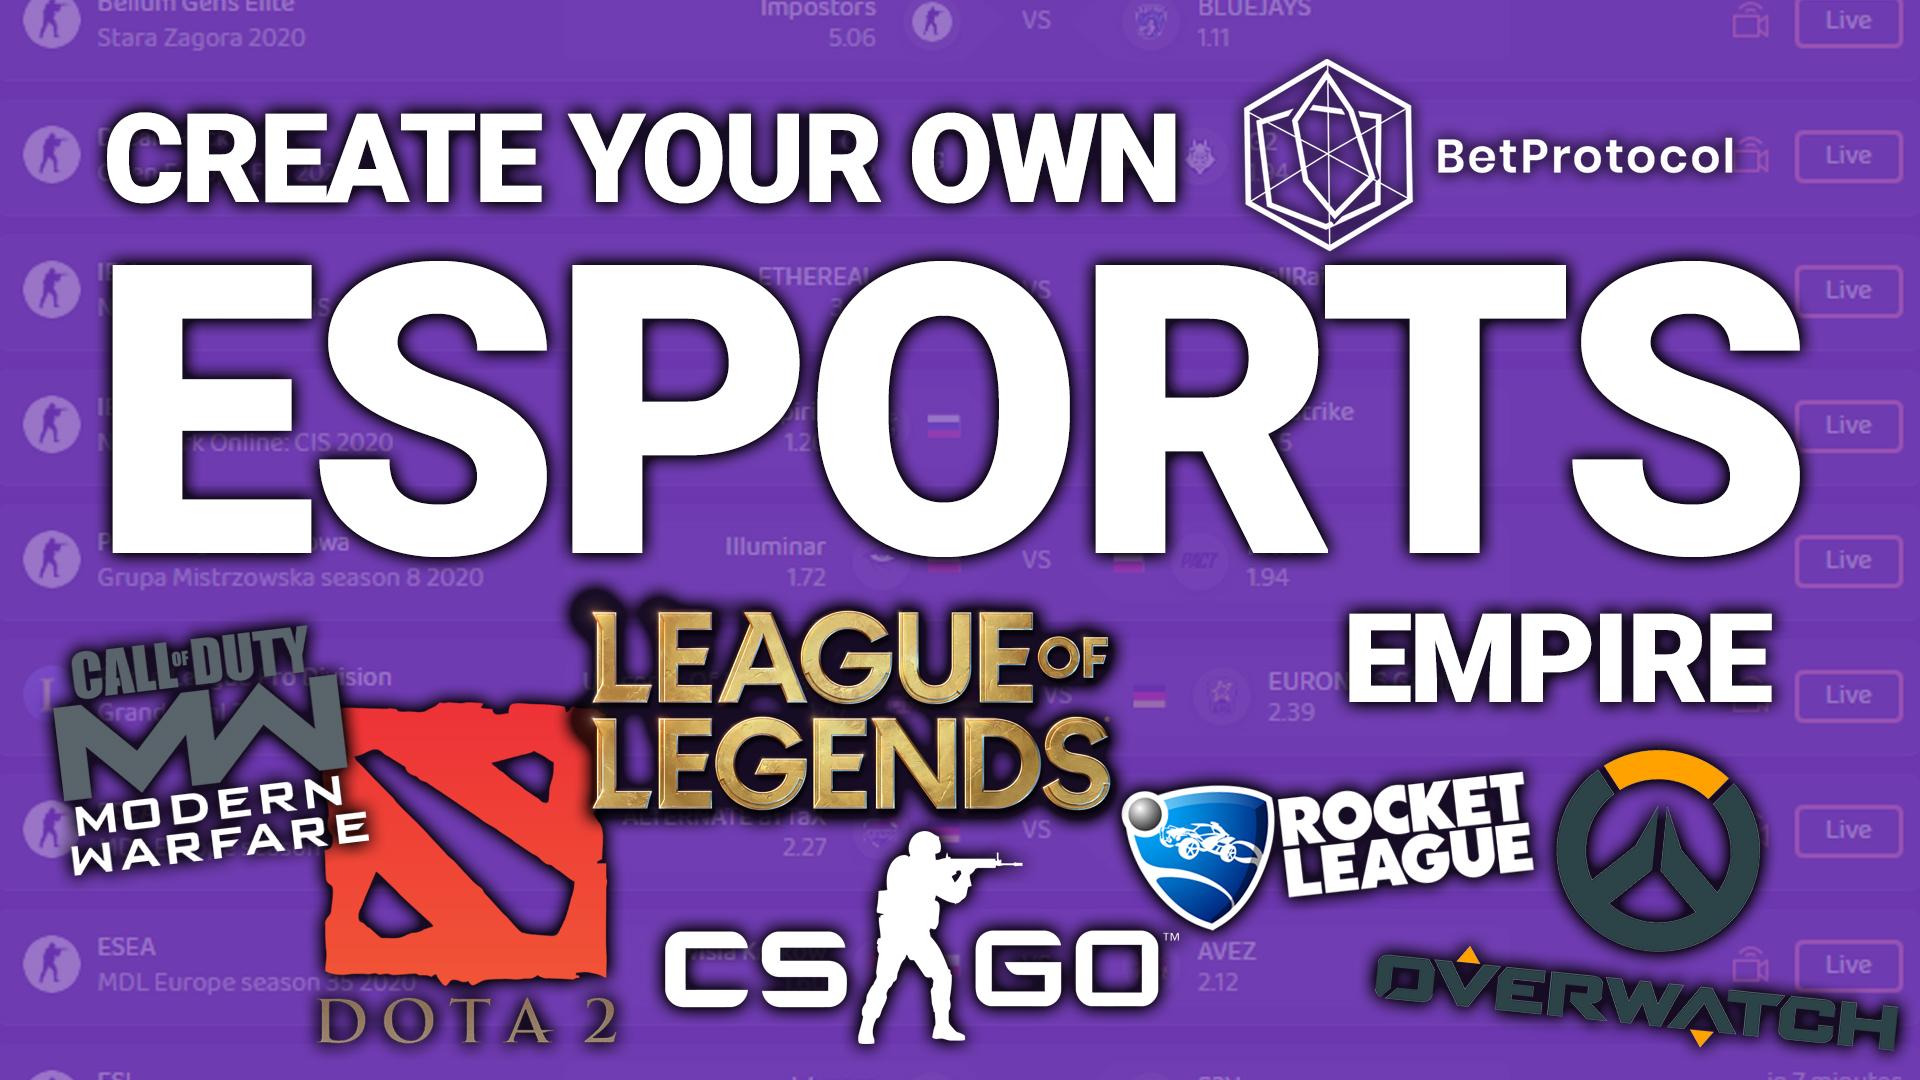 esports betting online CS:GO counter strike go league of legends dota 2 rocket league